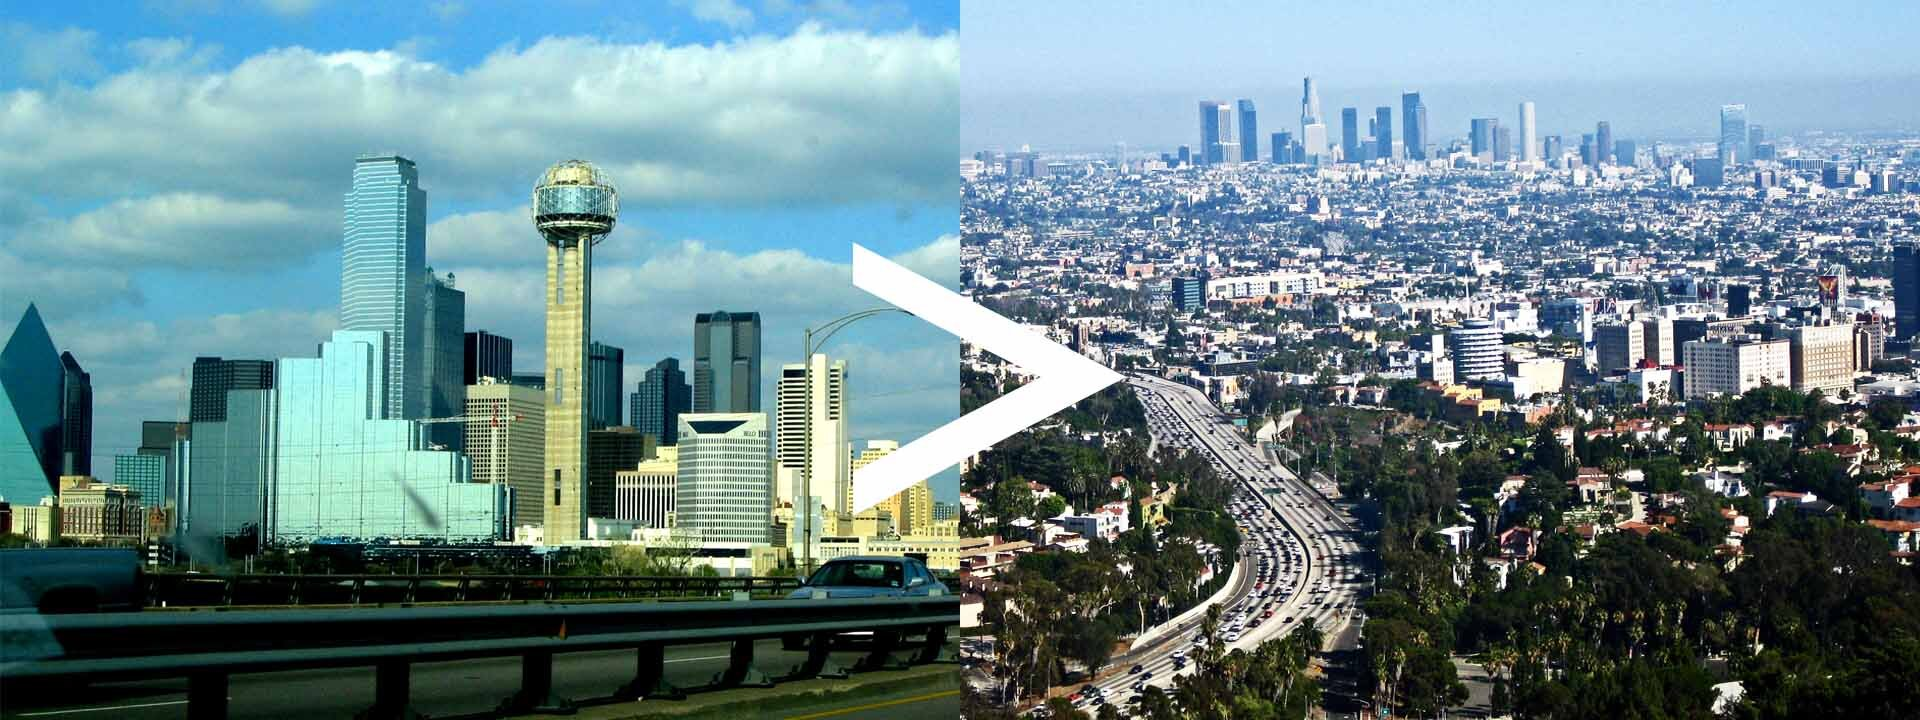 Texas to California Auto Transport